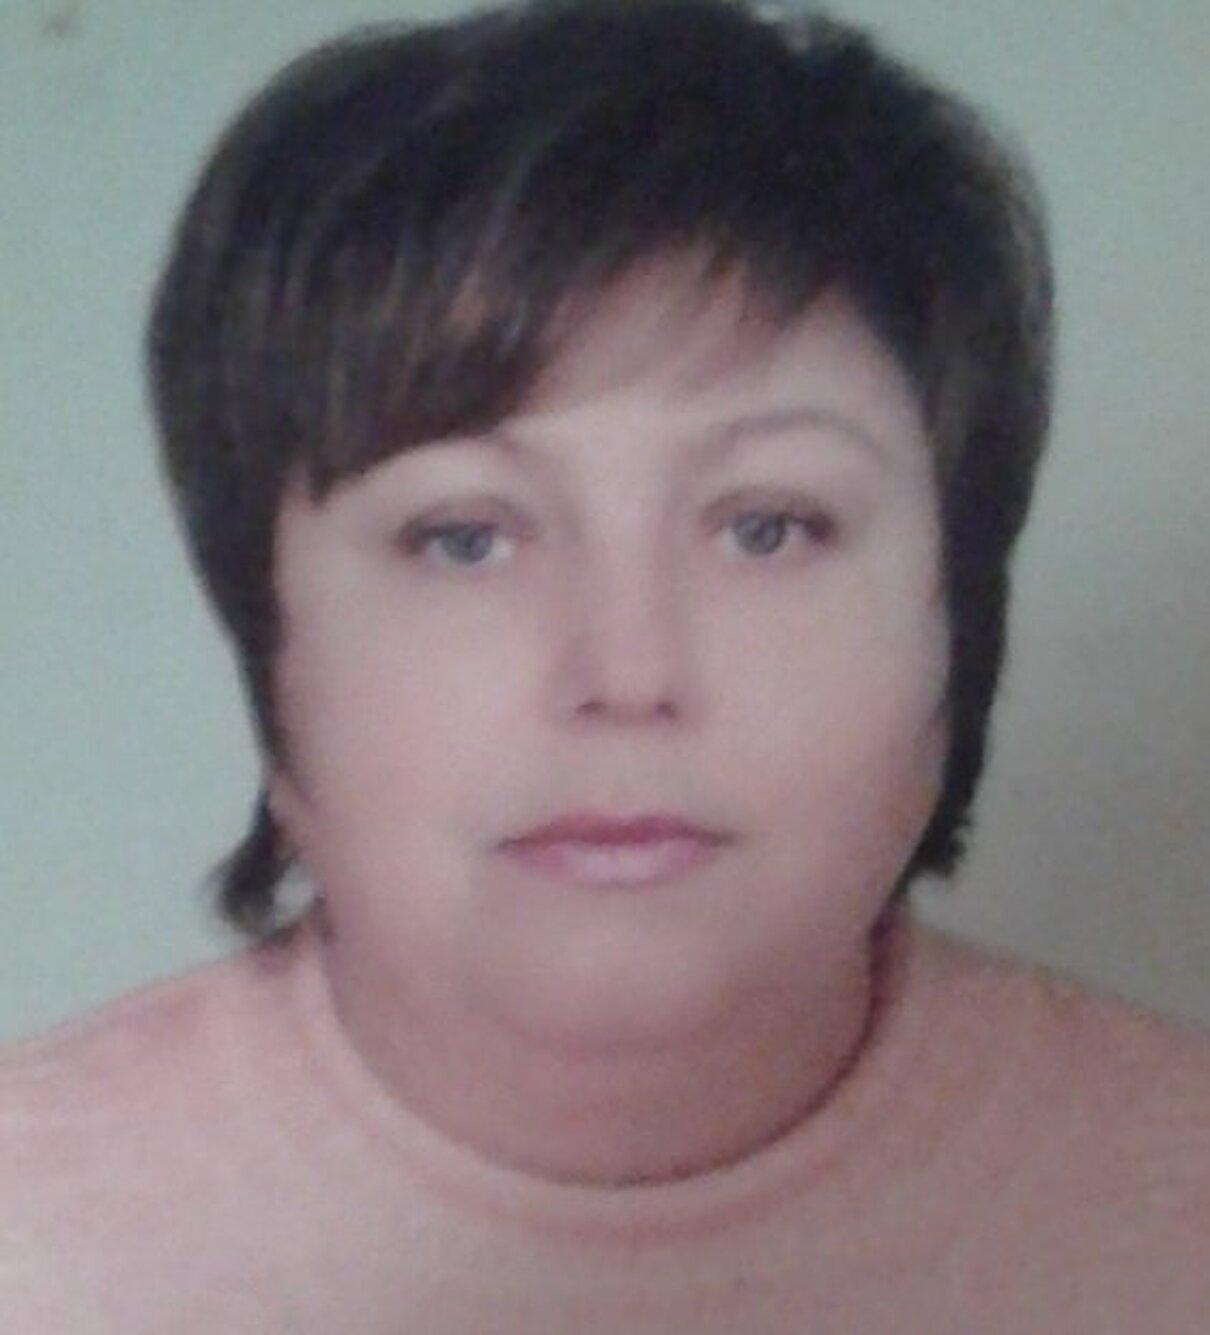 Жалоба-отзыв: Максимчук Елена Николаевна - Мошенничество при найме жилья